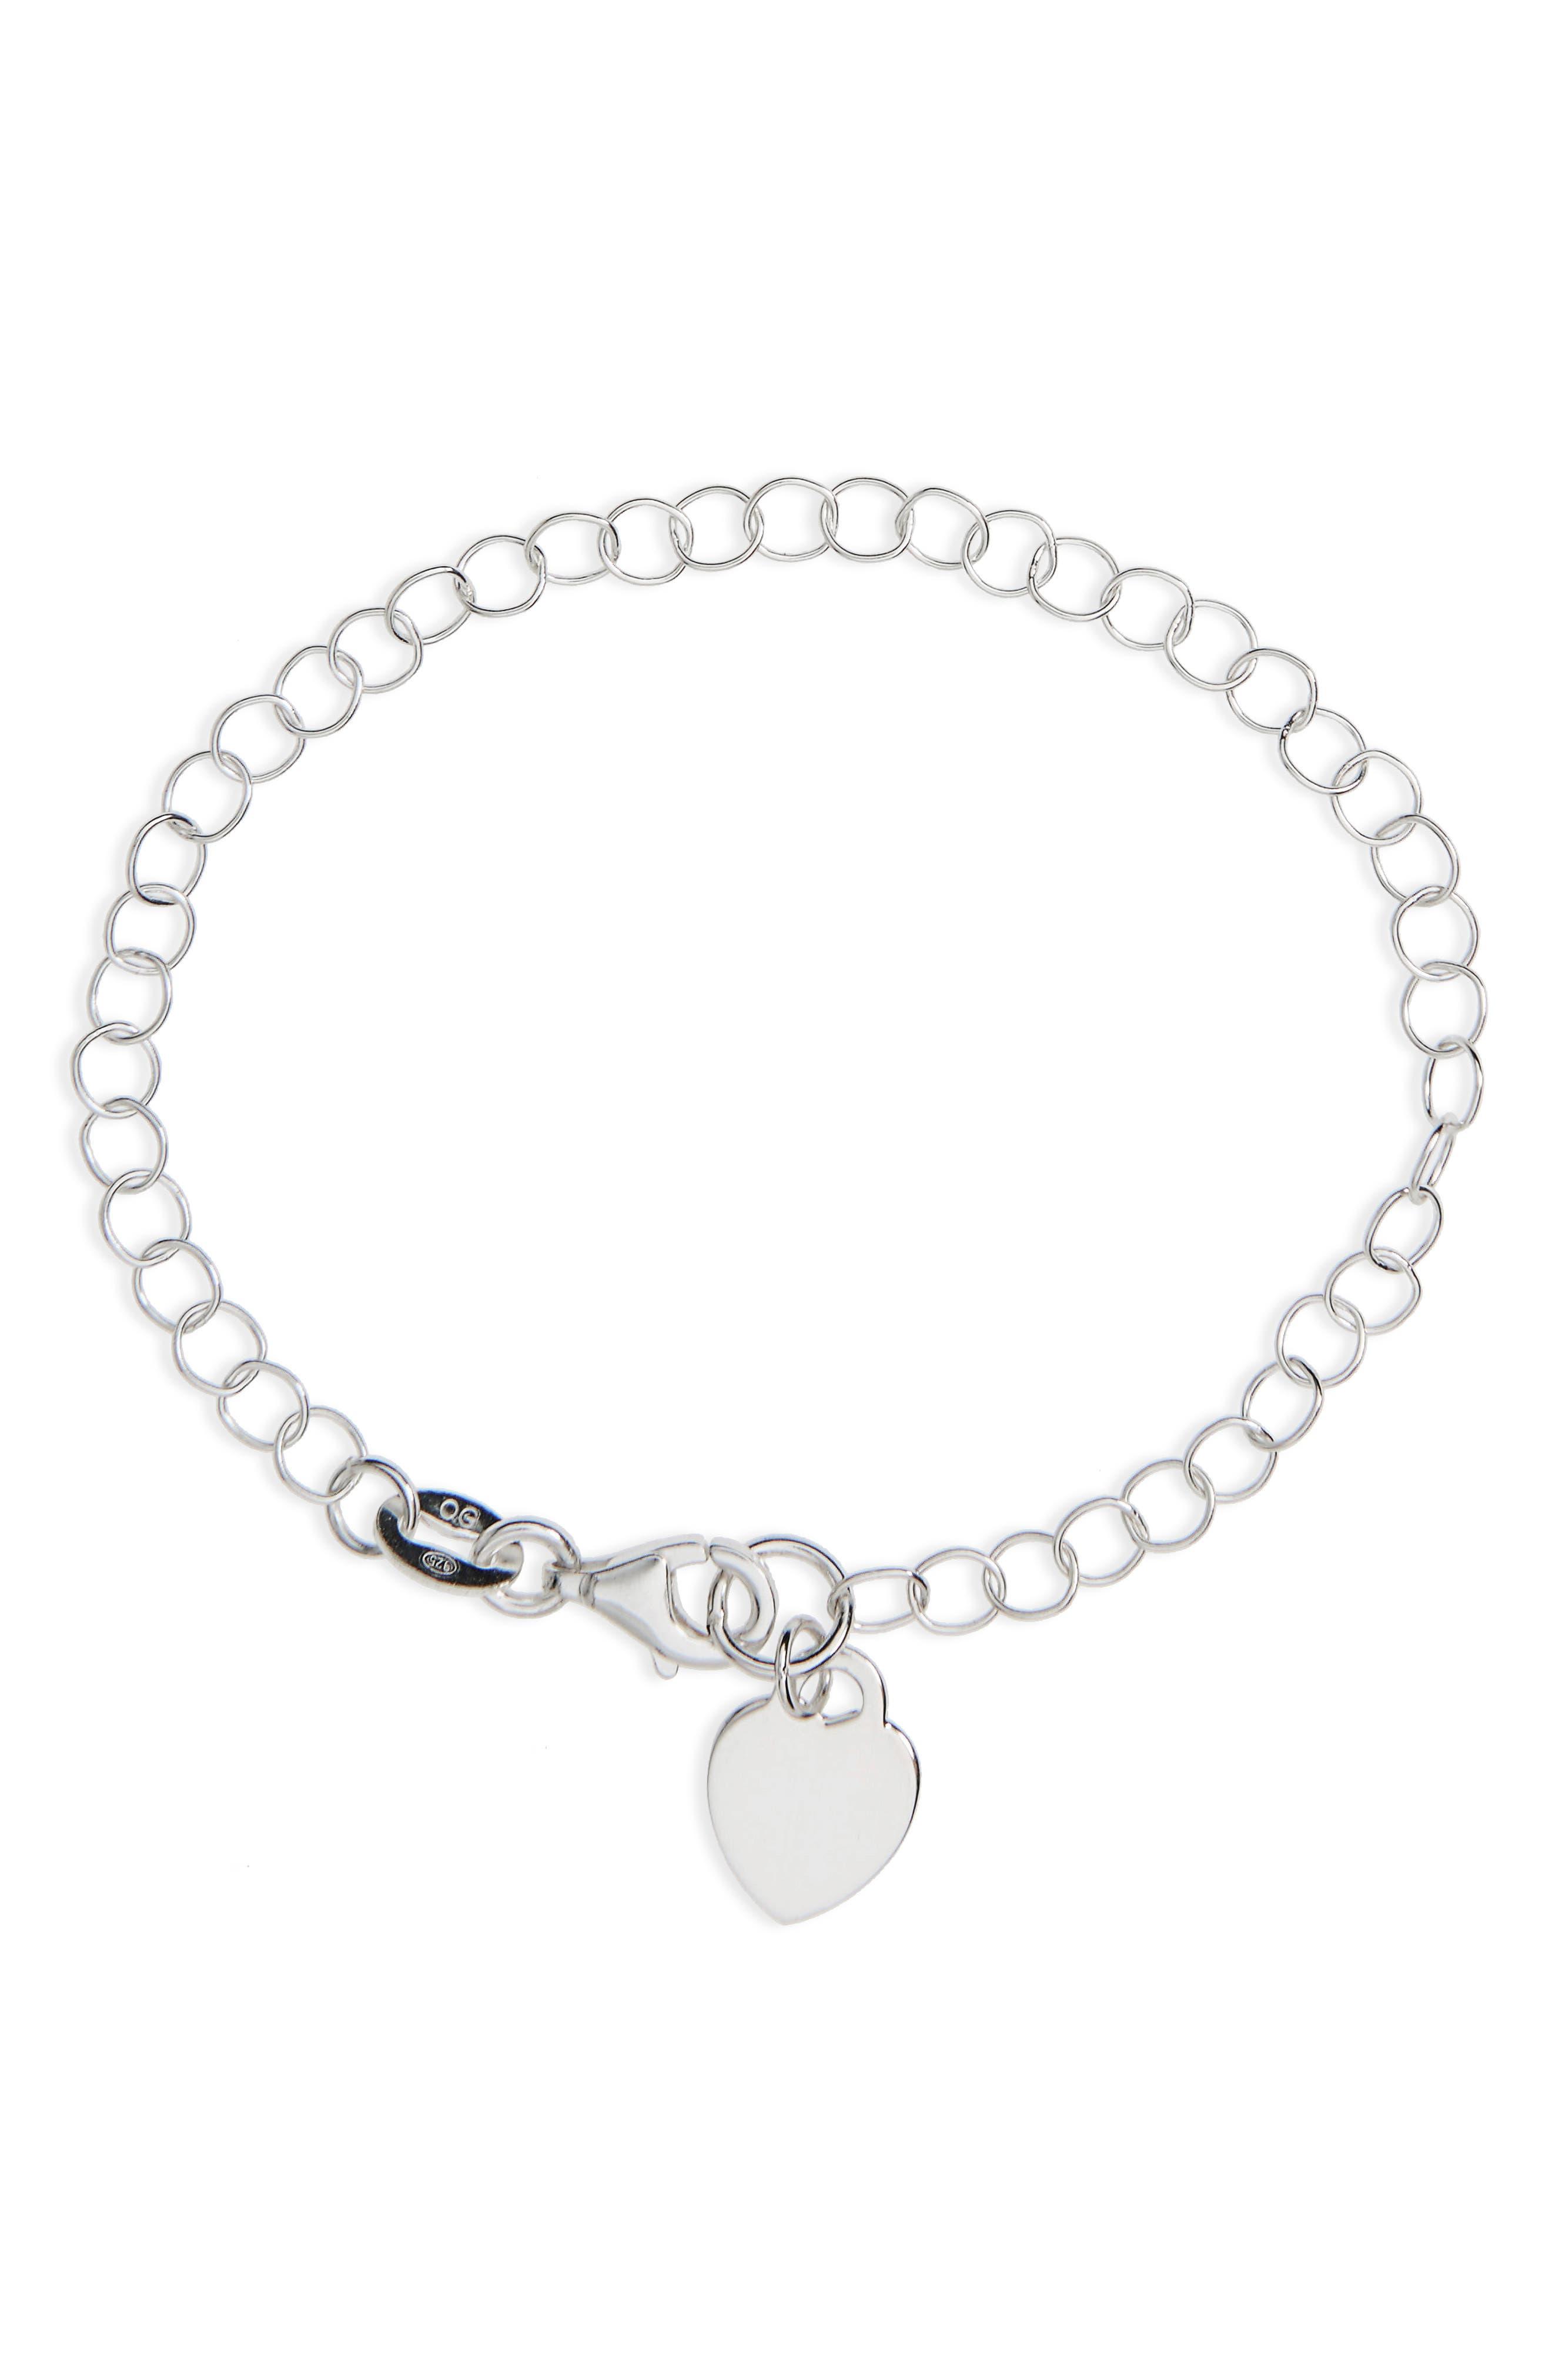 Main Image - Kardee Kids Heart Charm Sterling Bracelet (Girls)